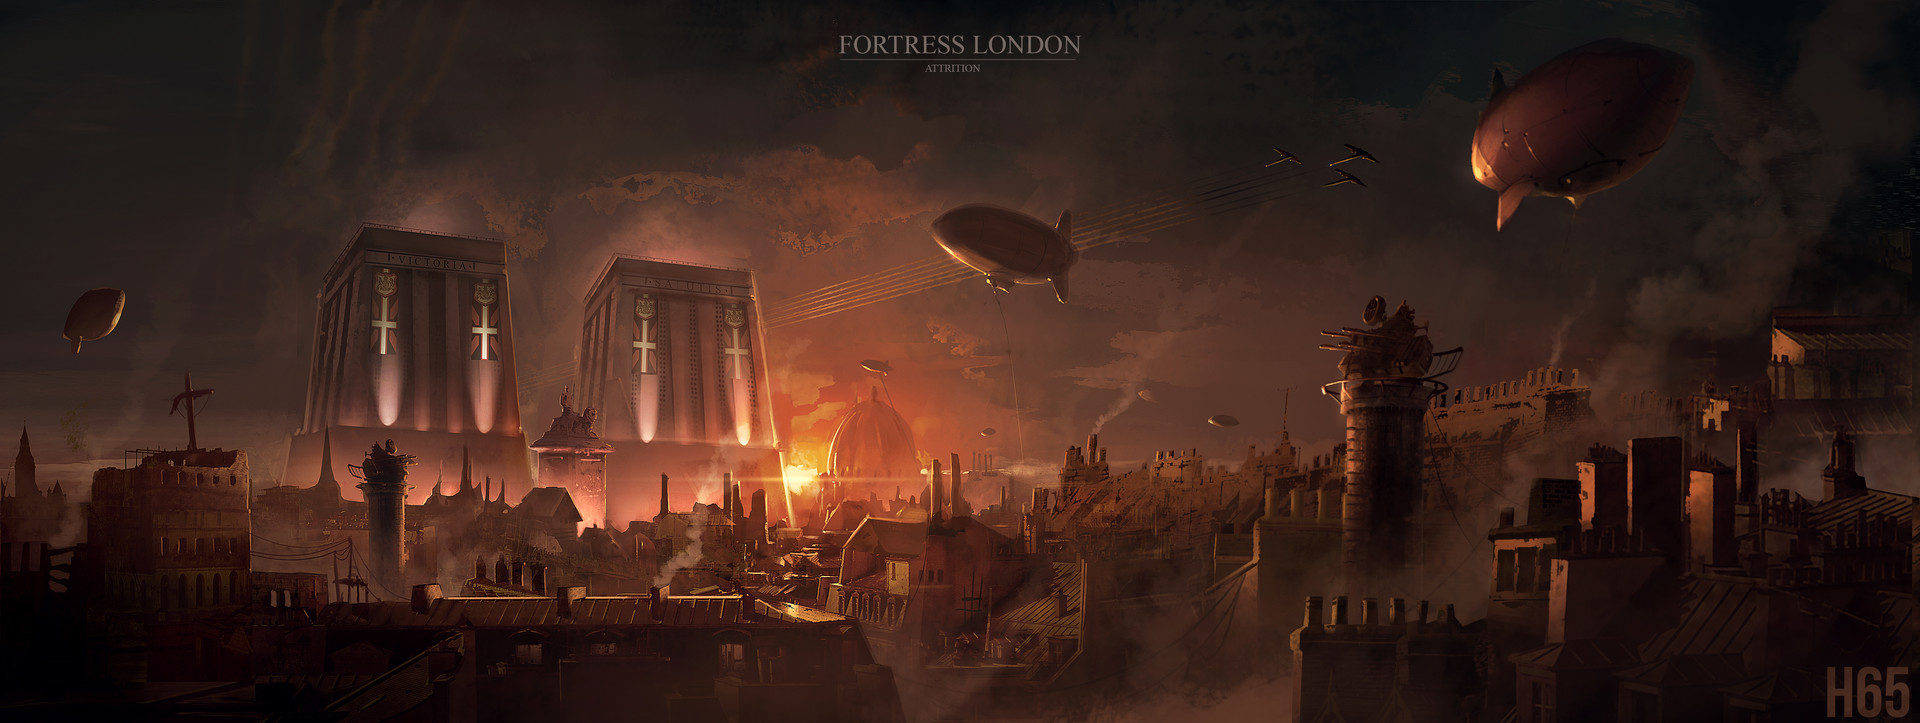 Samuel aaron whitehex fortress london 01